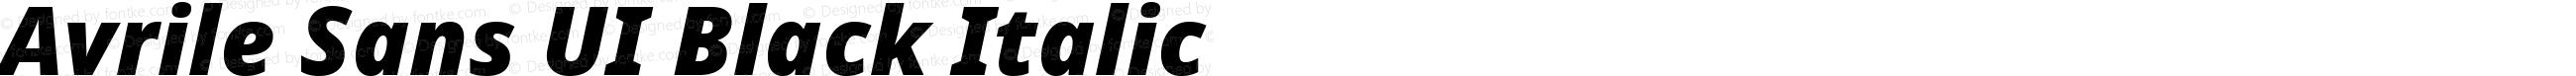 Avrile Sans UI Black Italic